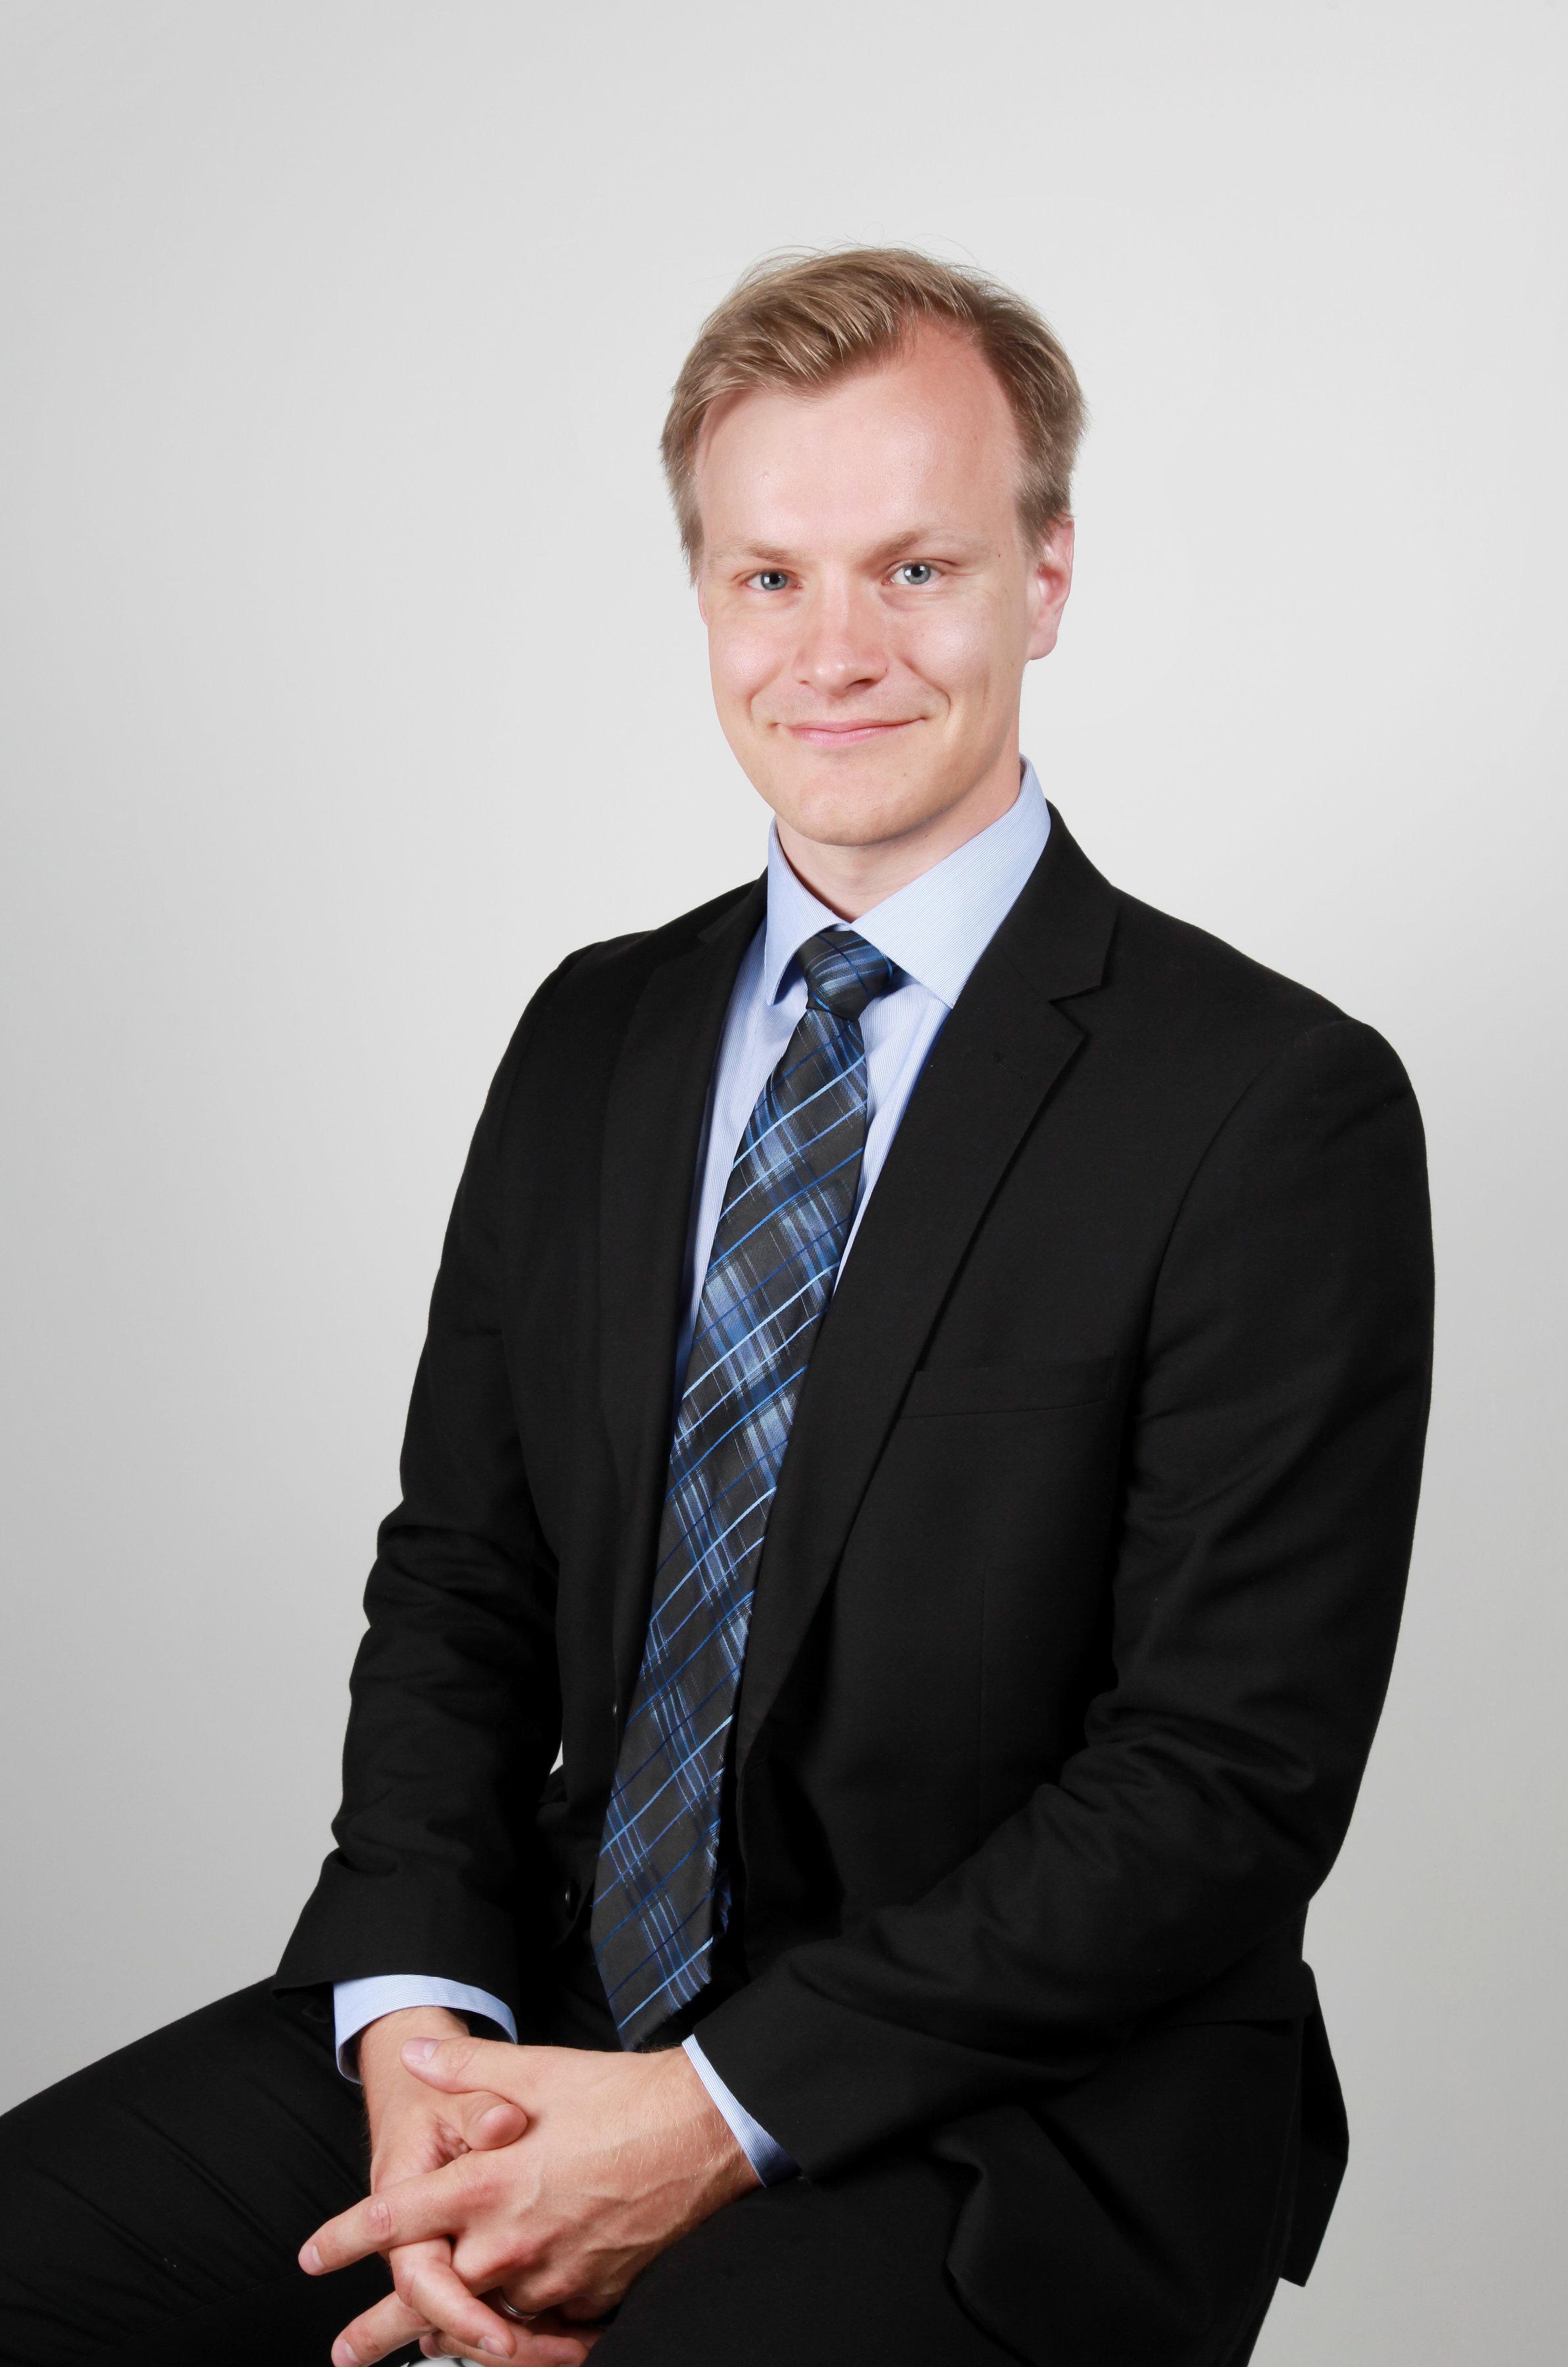 Jonne Rantanen, asianajaja, varatuomari